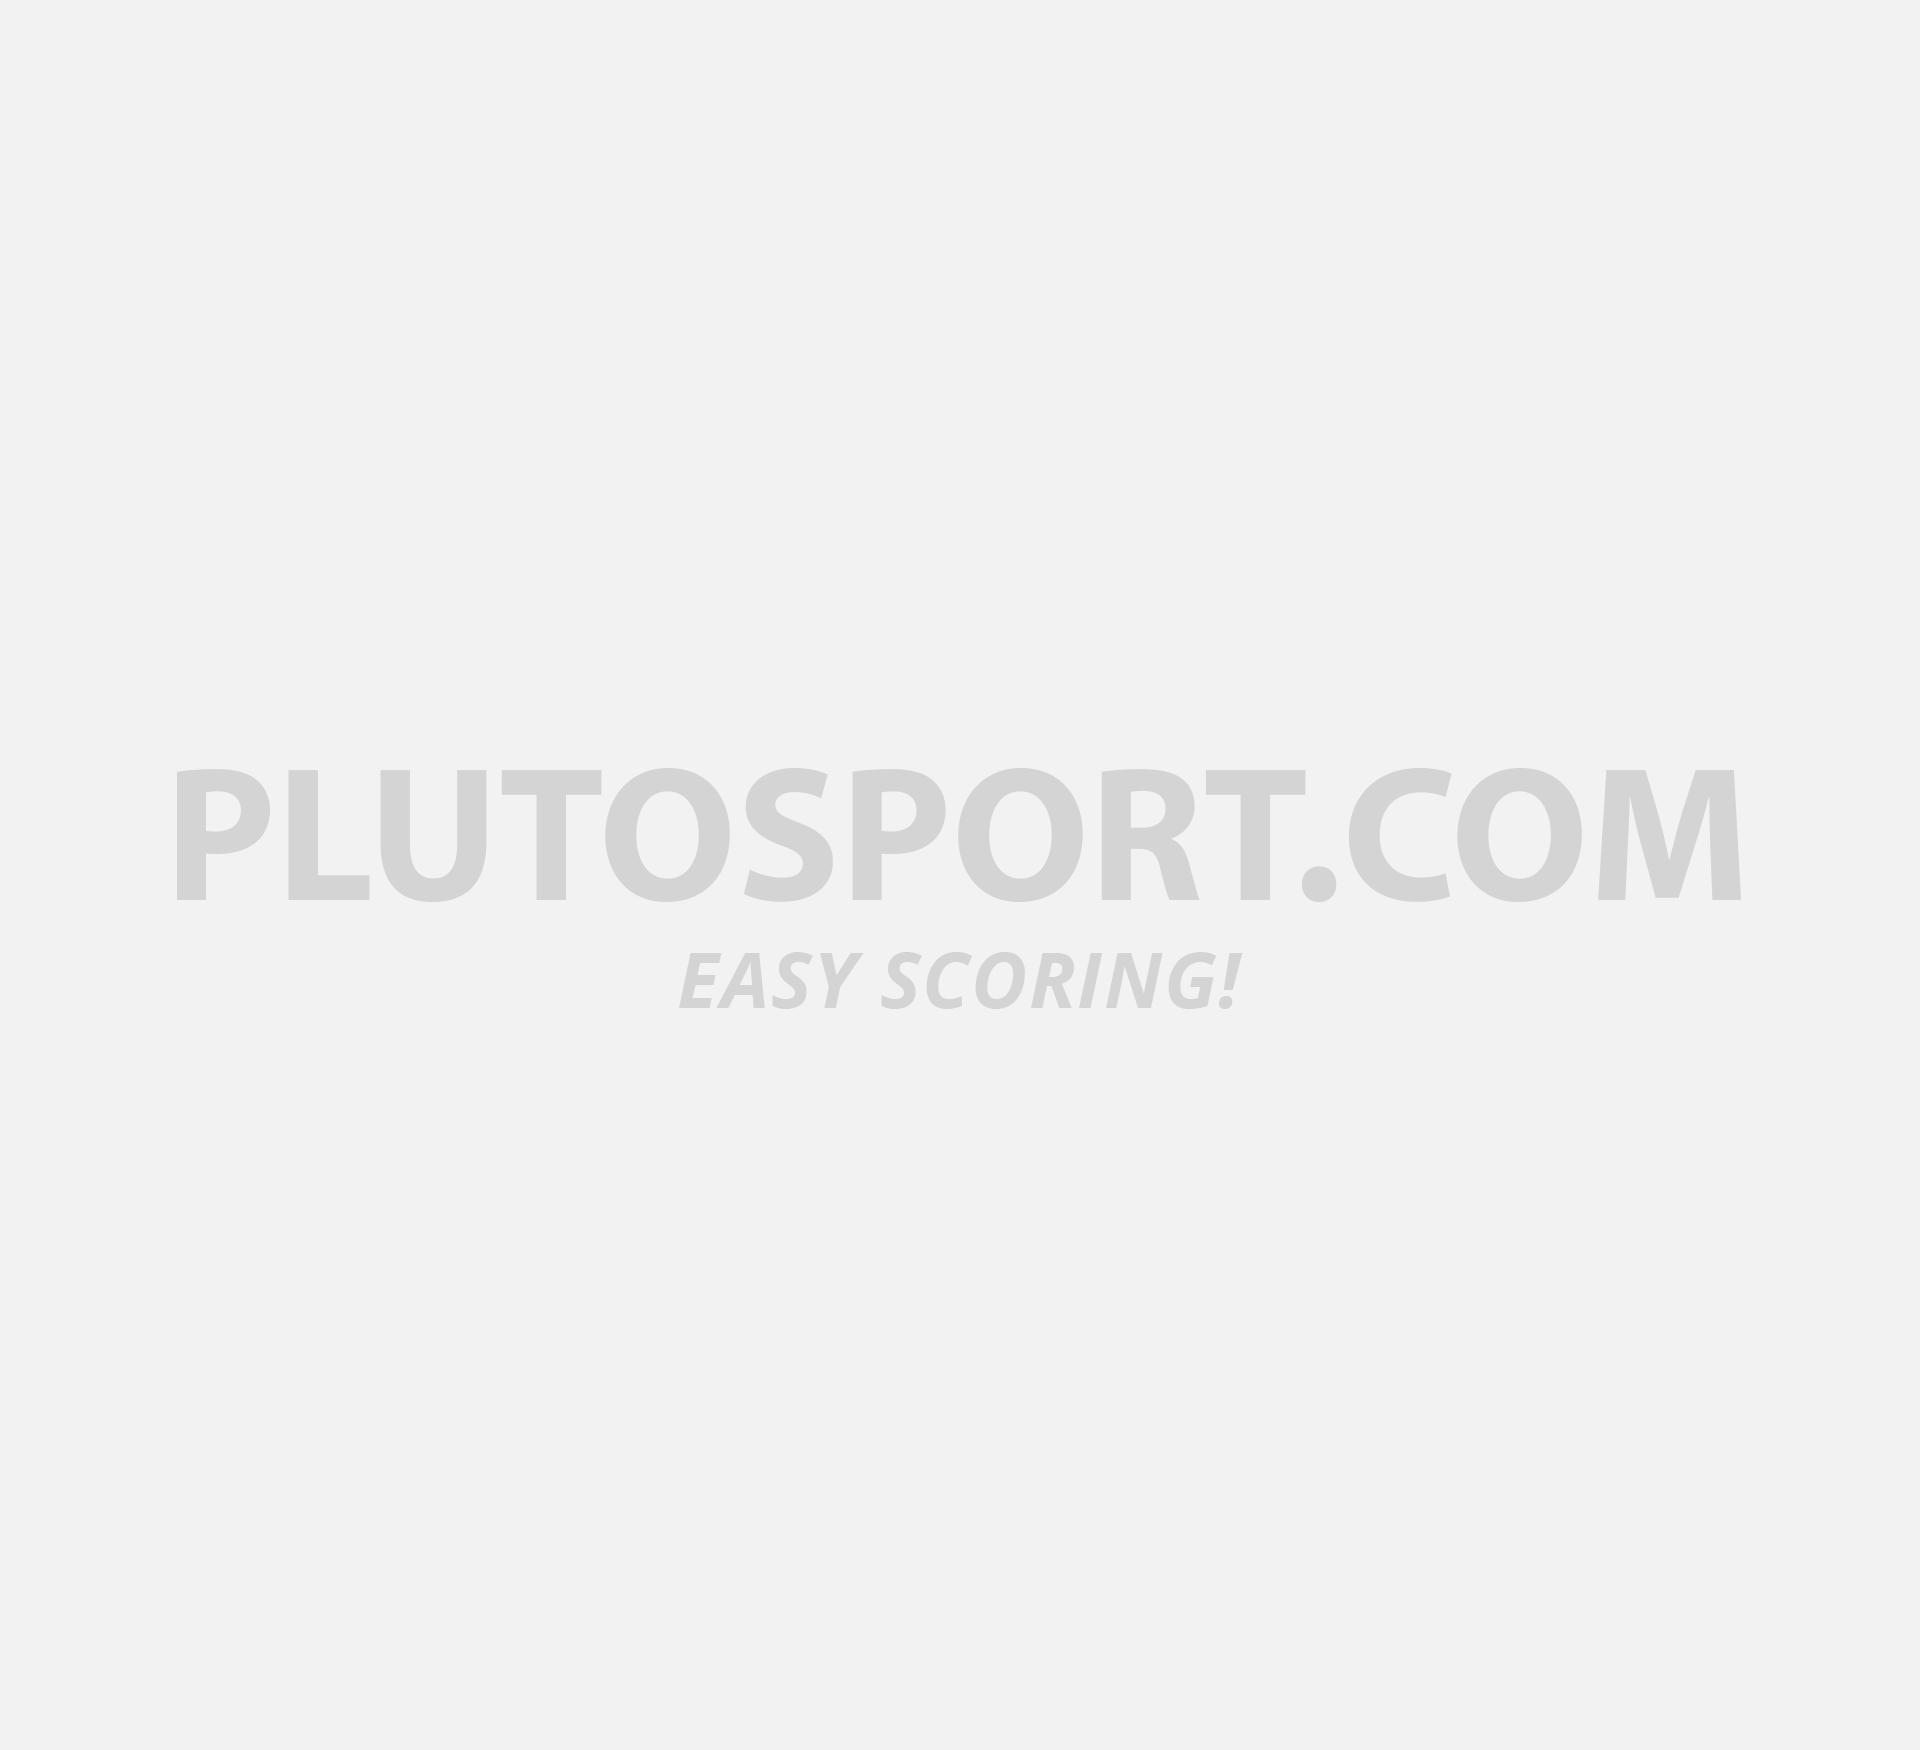 Adidas Predator Roll Finger Goalkeeperglove - Without fingersave - Gloves -  Goalkeepers - Football - Sports  9e9adfa82